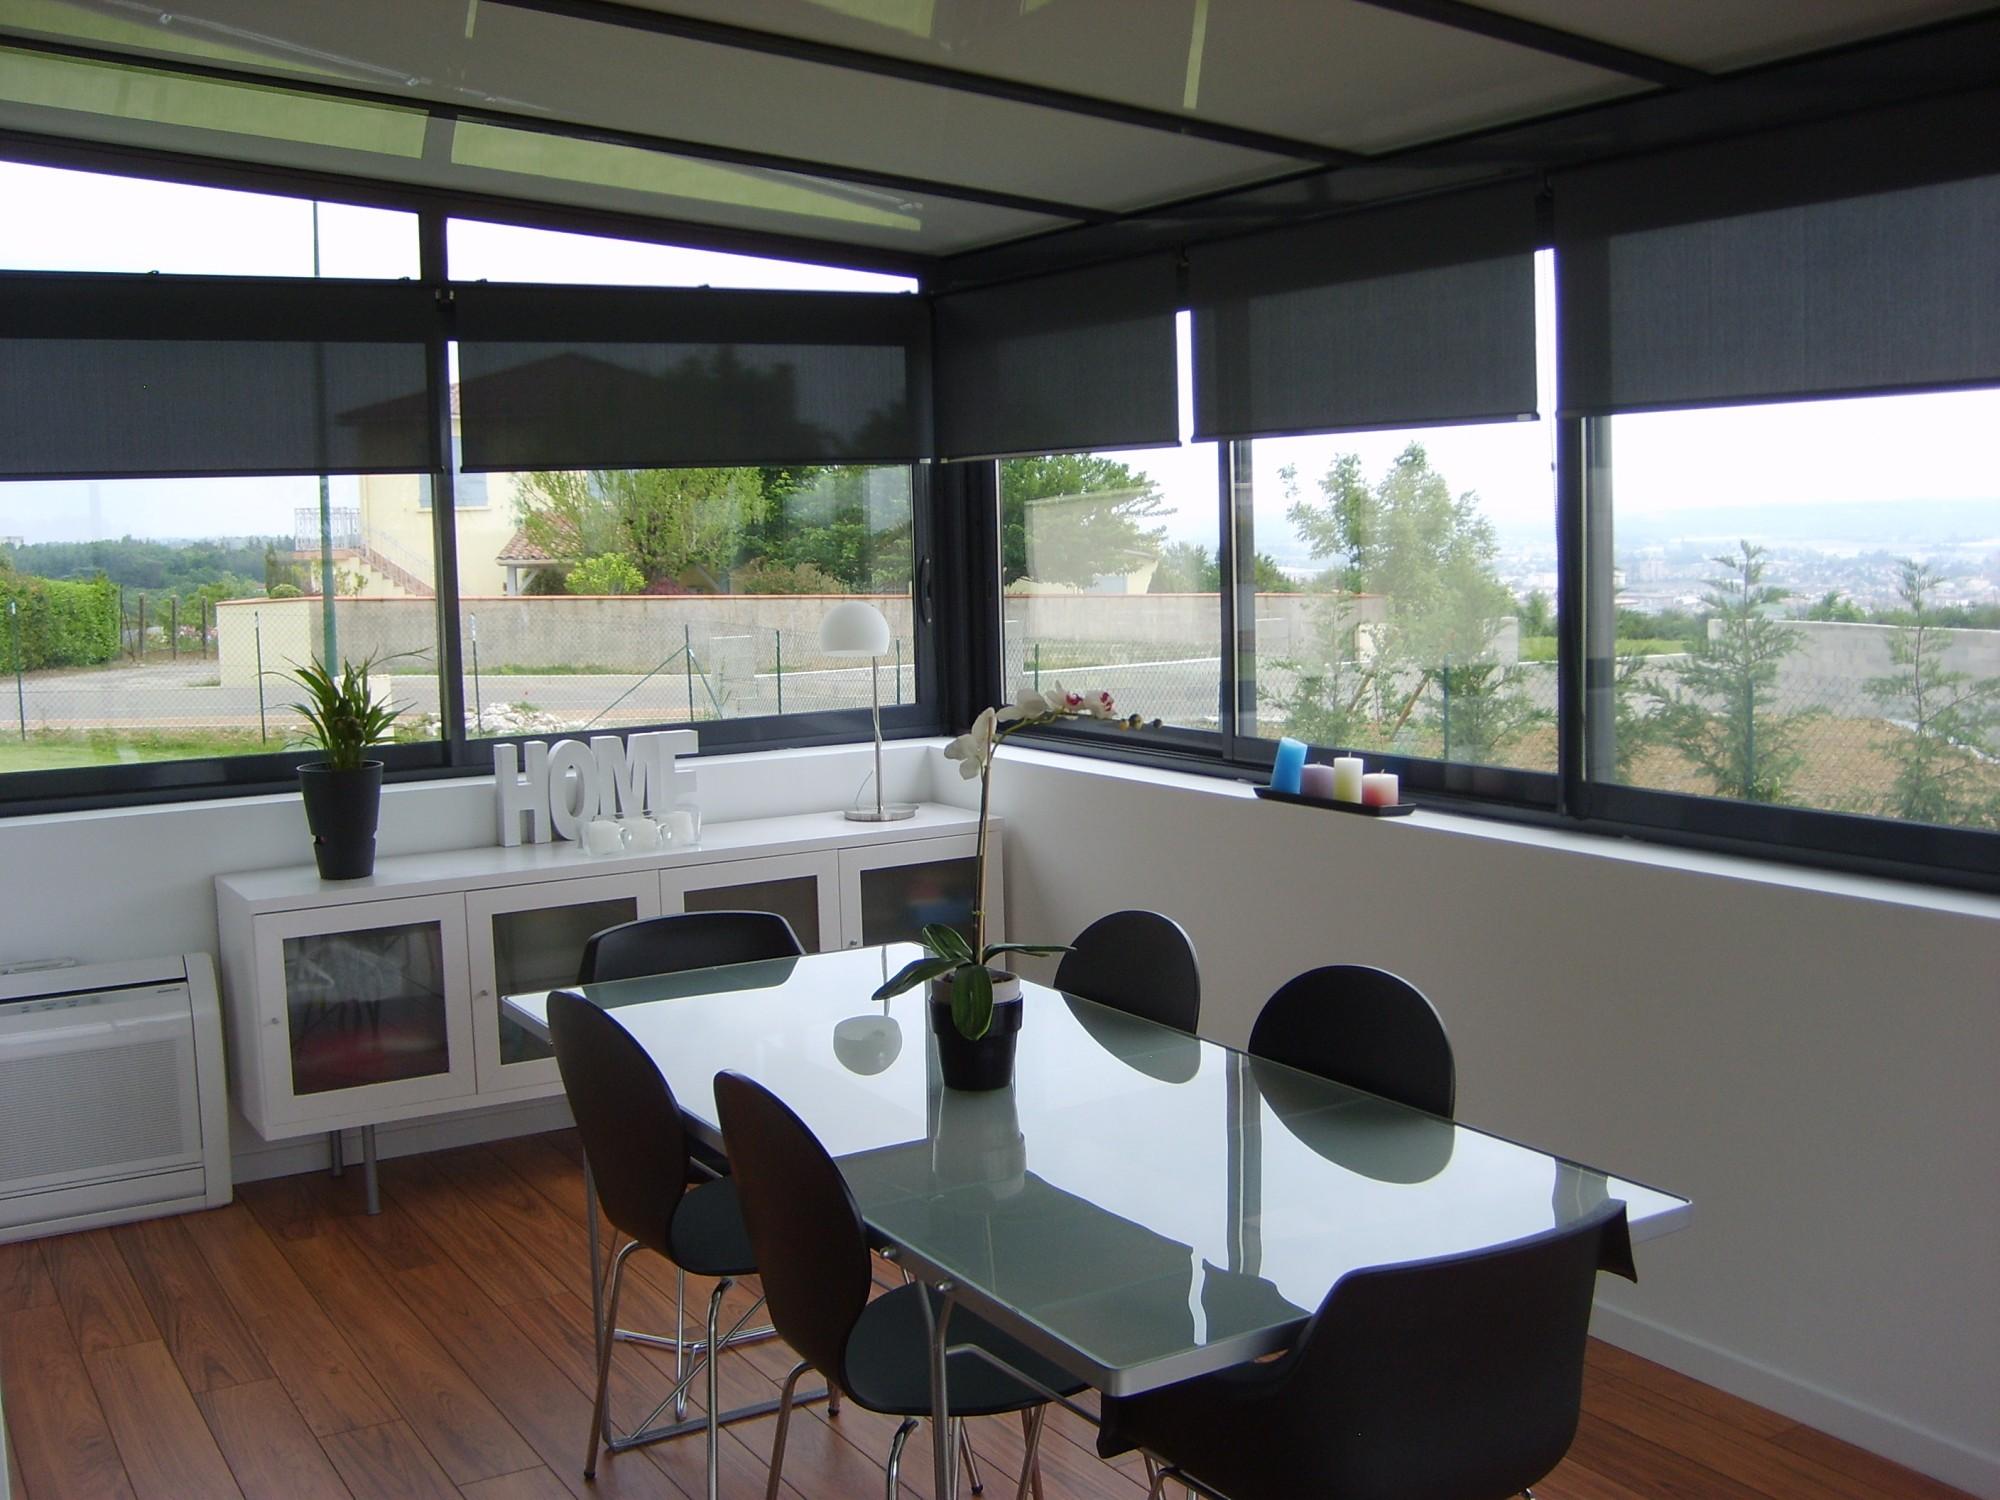 stores int rieurs de protection solaire perspective v randa. Black Bedroom Furniture Sets. Home Design Ideas